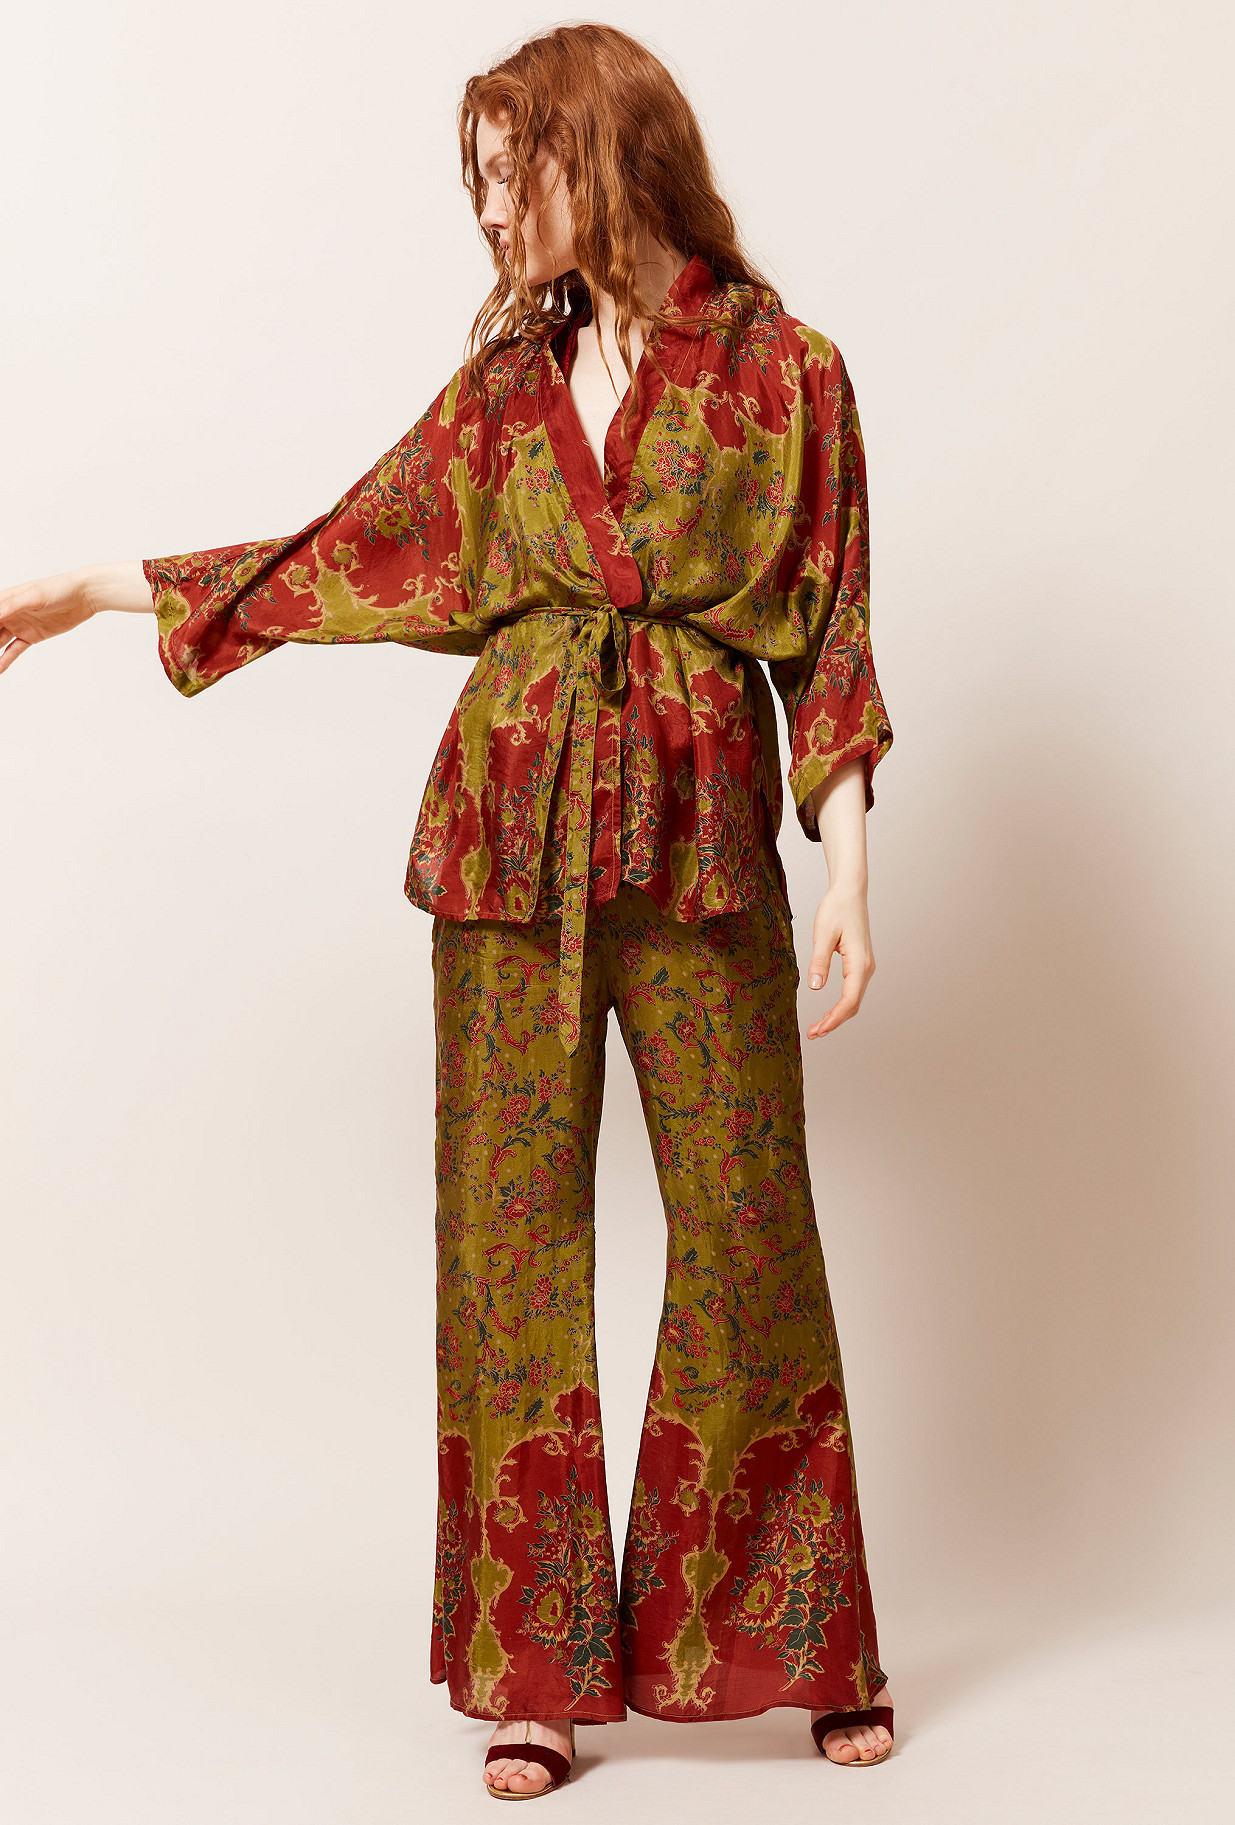 Paris clothes store Kimono  Davince french designer fashion Paris